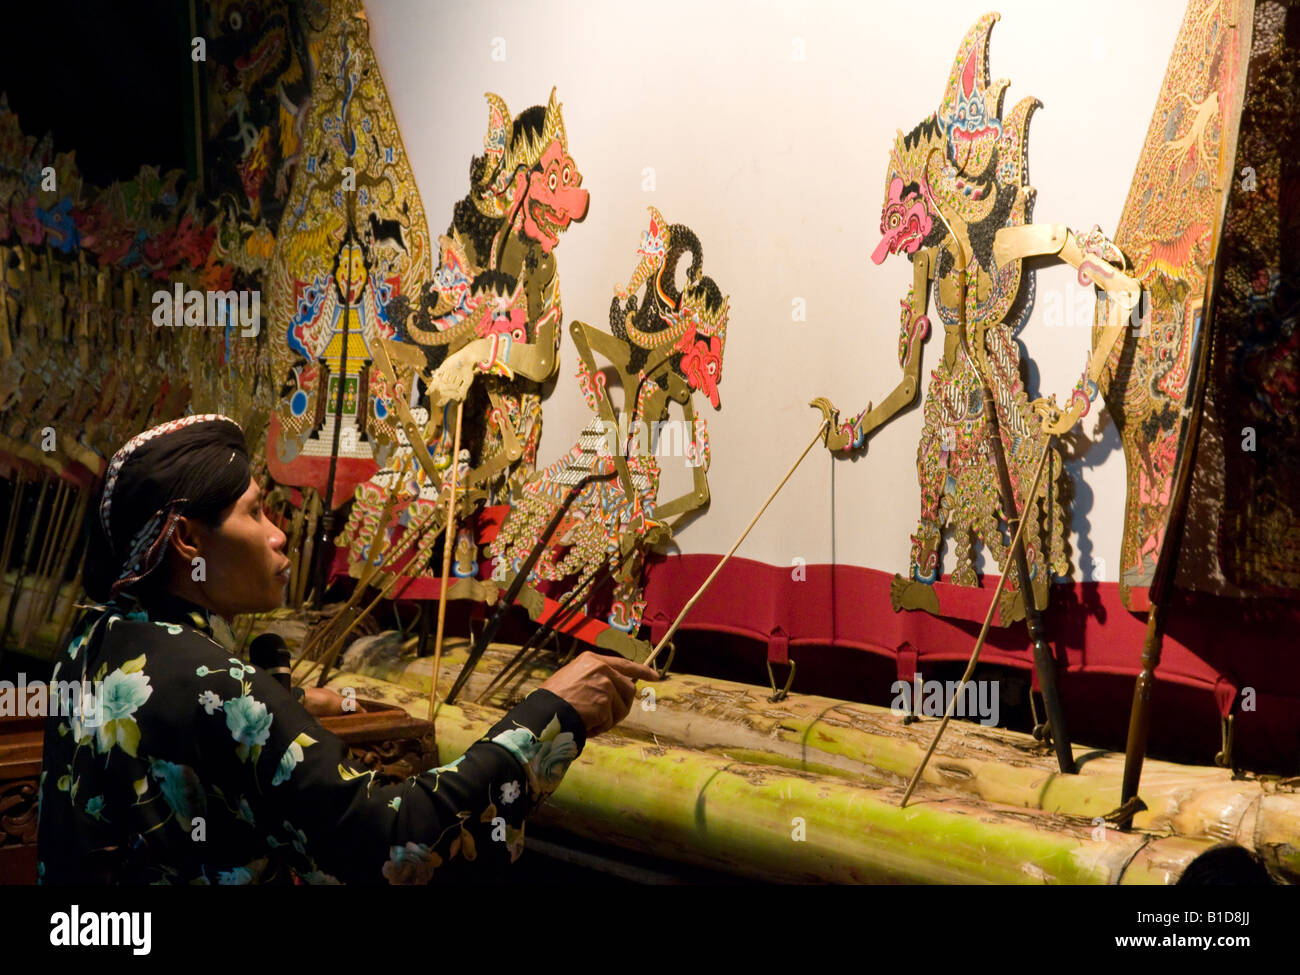 Indonesia java island yogyakarta sonobudoyo museum wayang - Artesania de indonesia ...